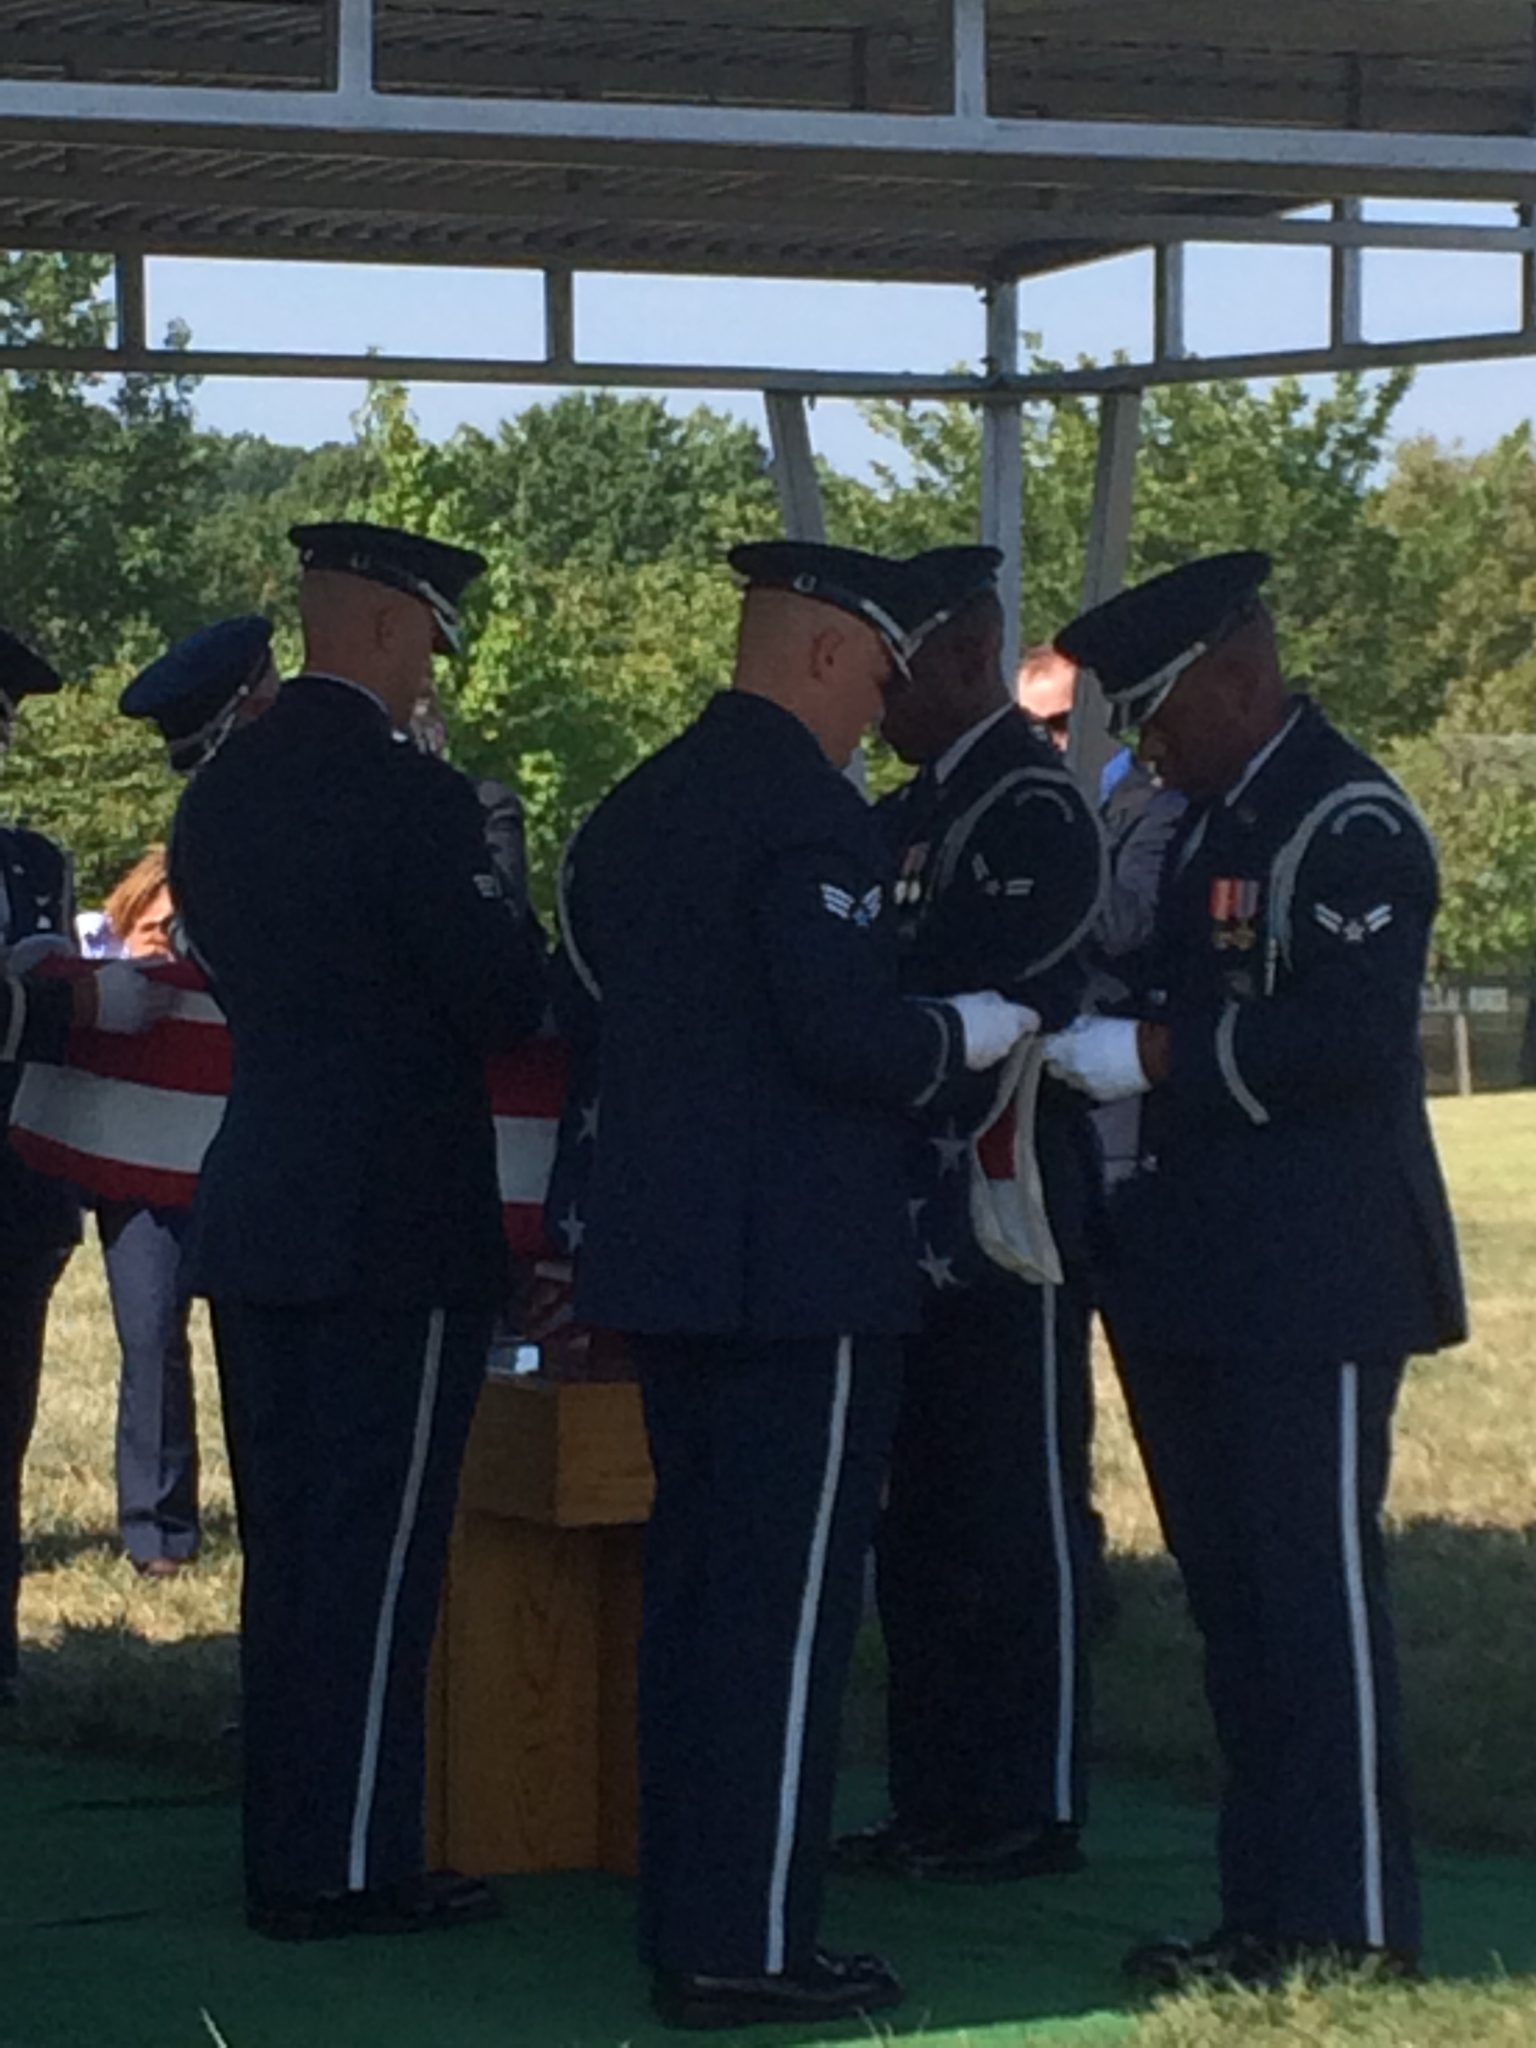 Air Force Honor Guard. Image: Benet Wilson